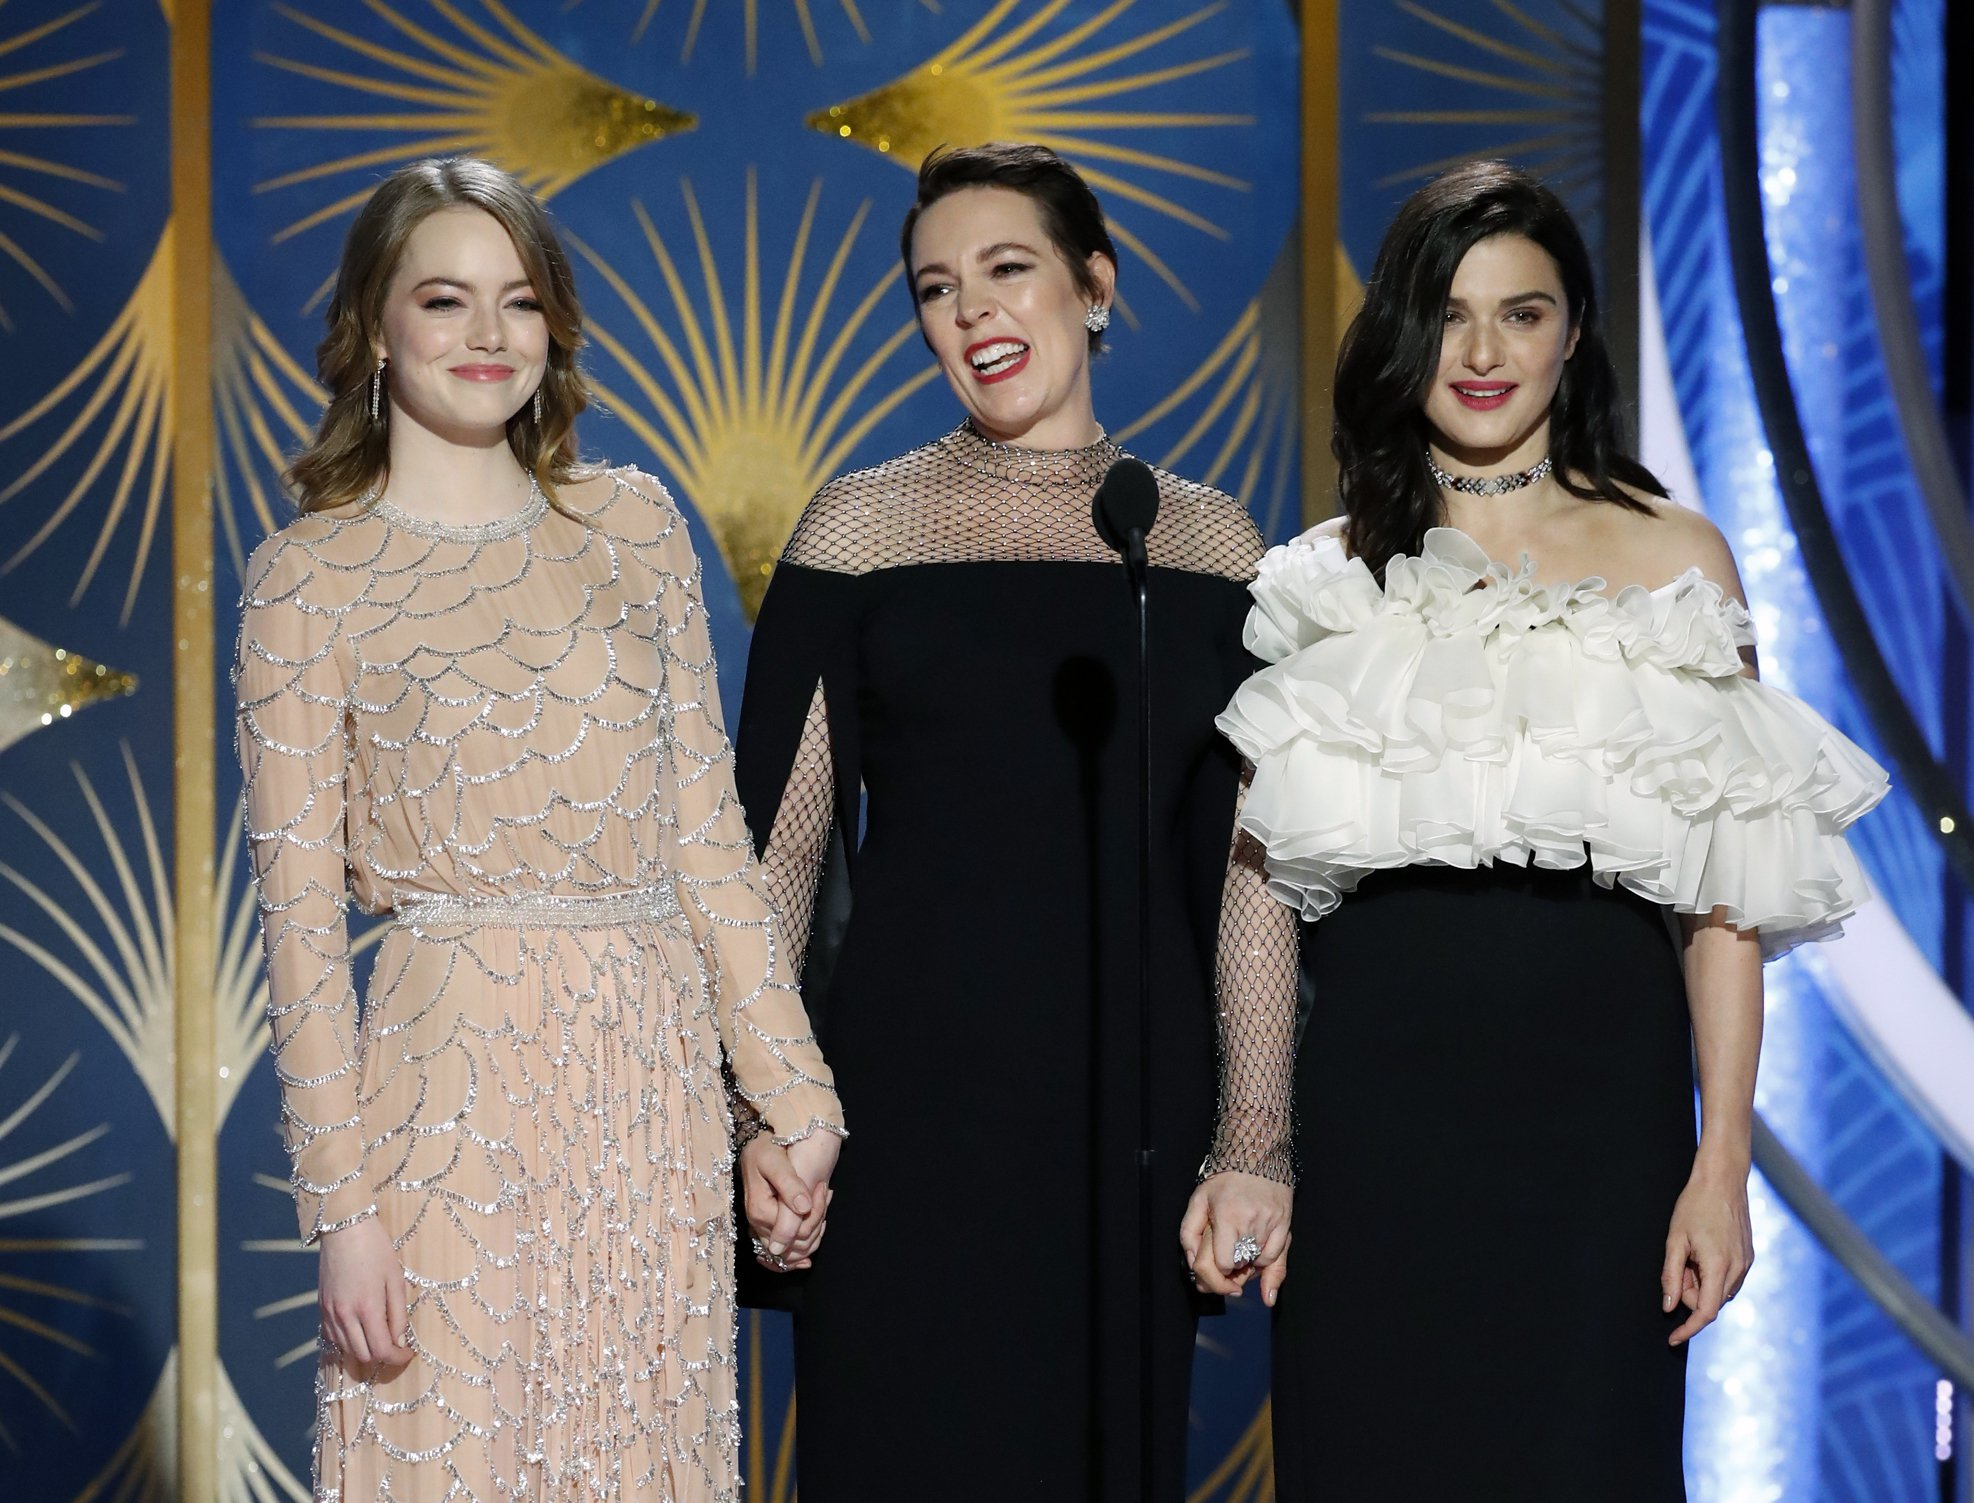 Olivia Colman thanks her 'b****es' Emma Stone and Rachel Weisz at Golden Globes 2019